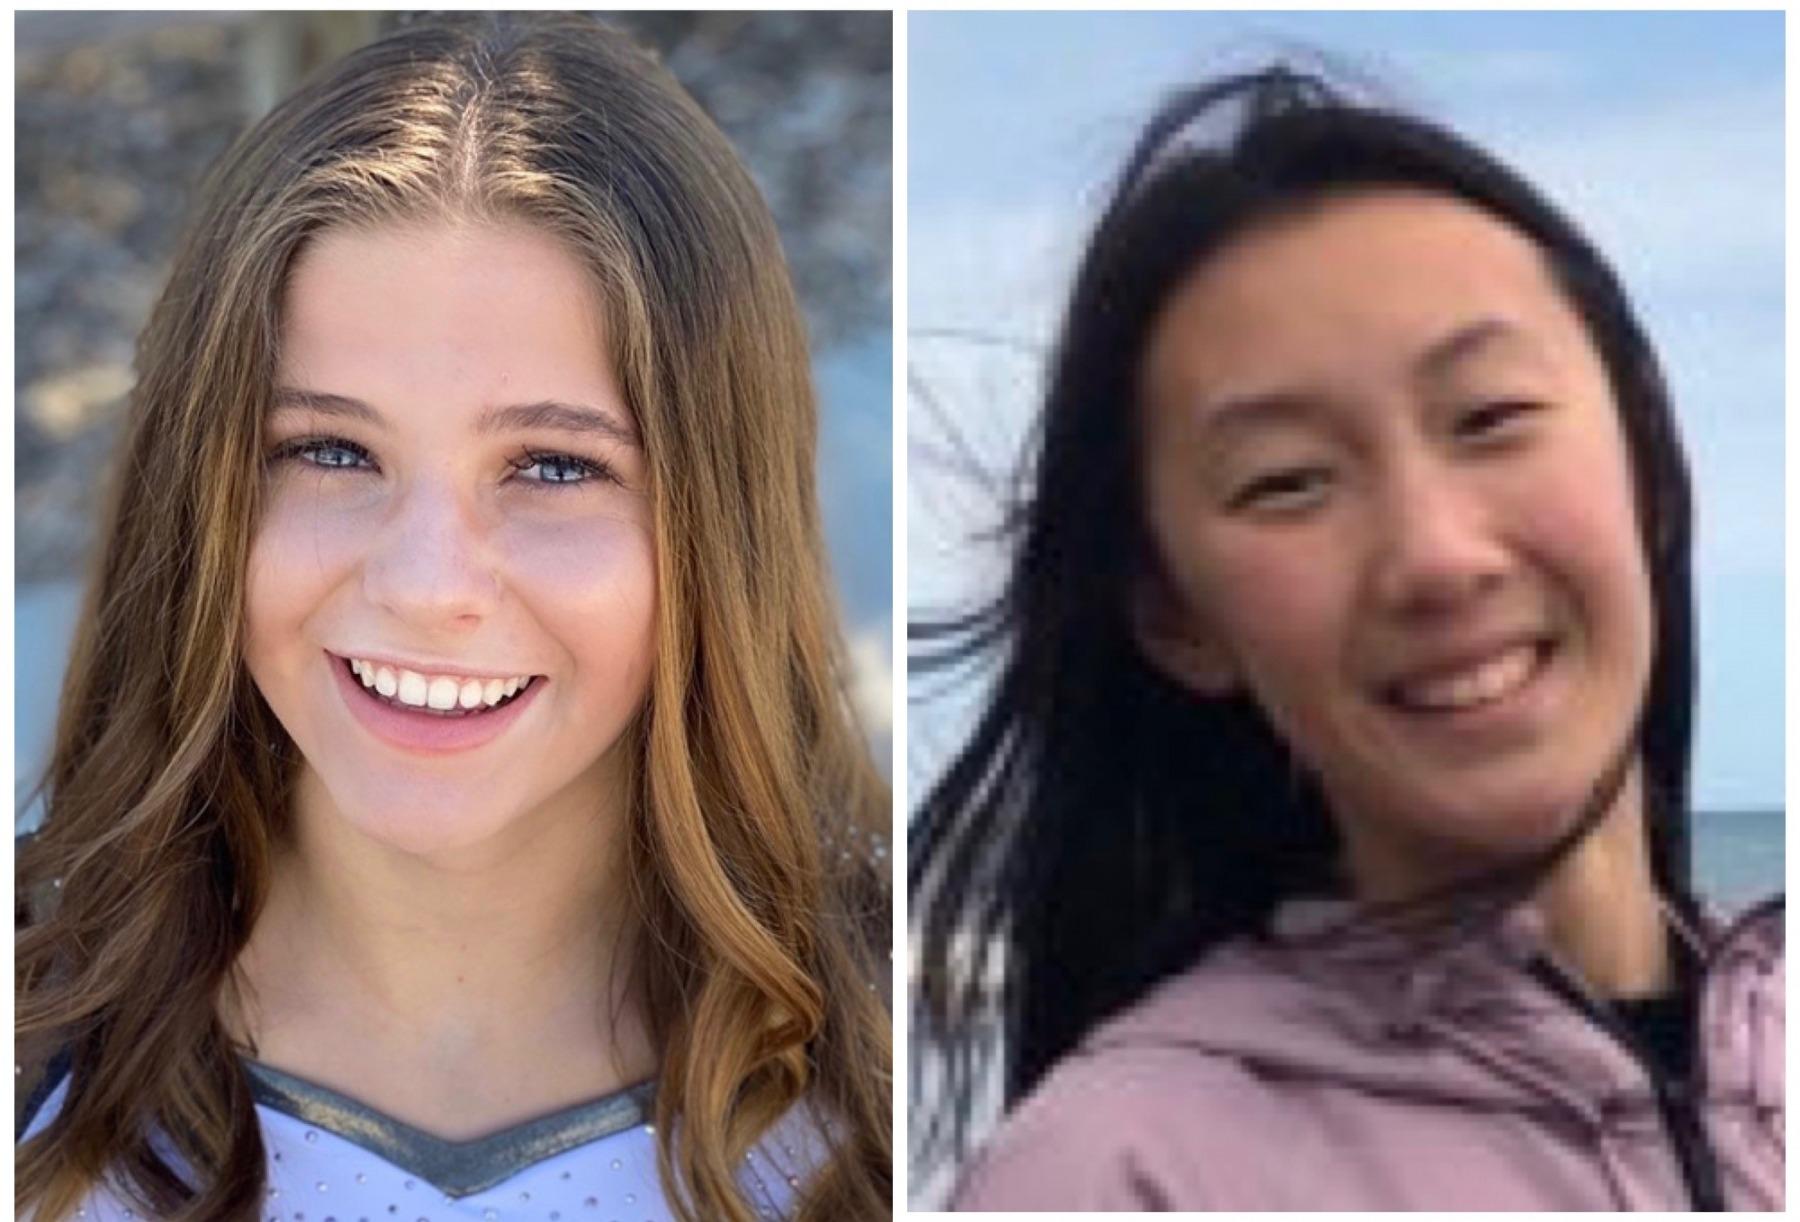 Santa Clarita Students Chosen as Panelists for the California Youth Leadership Summit